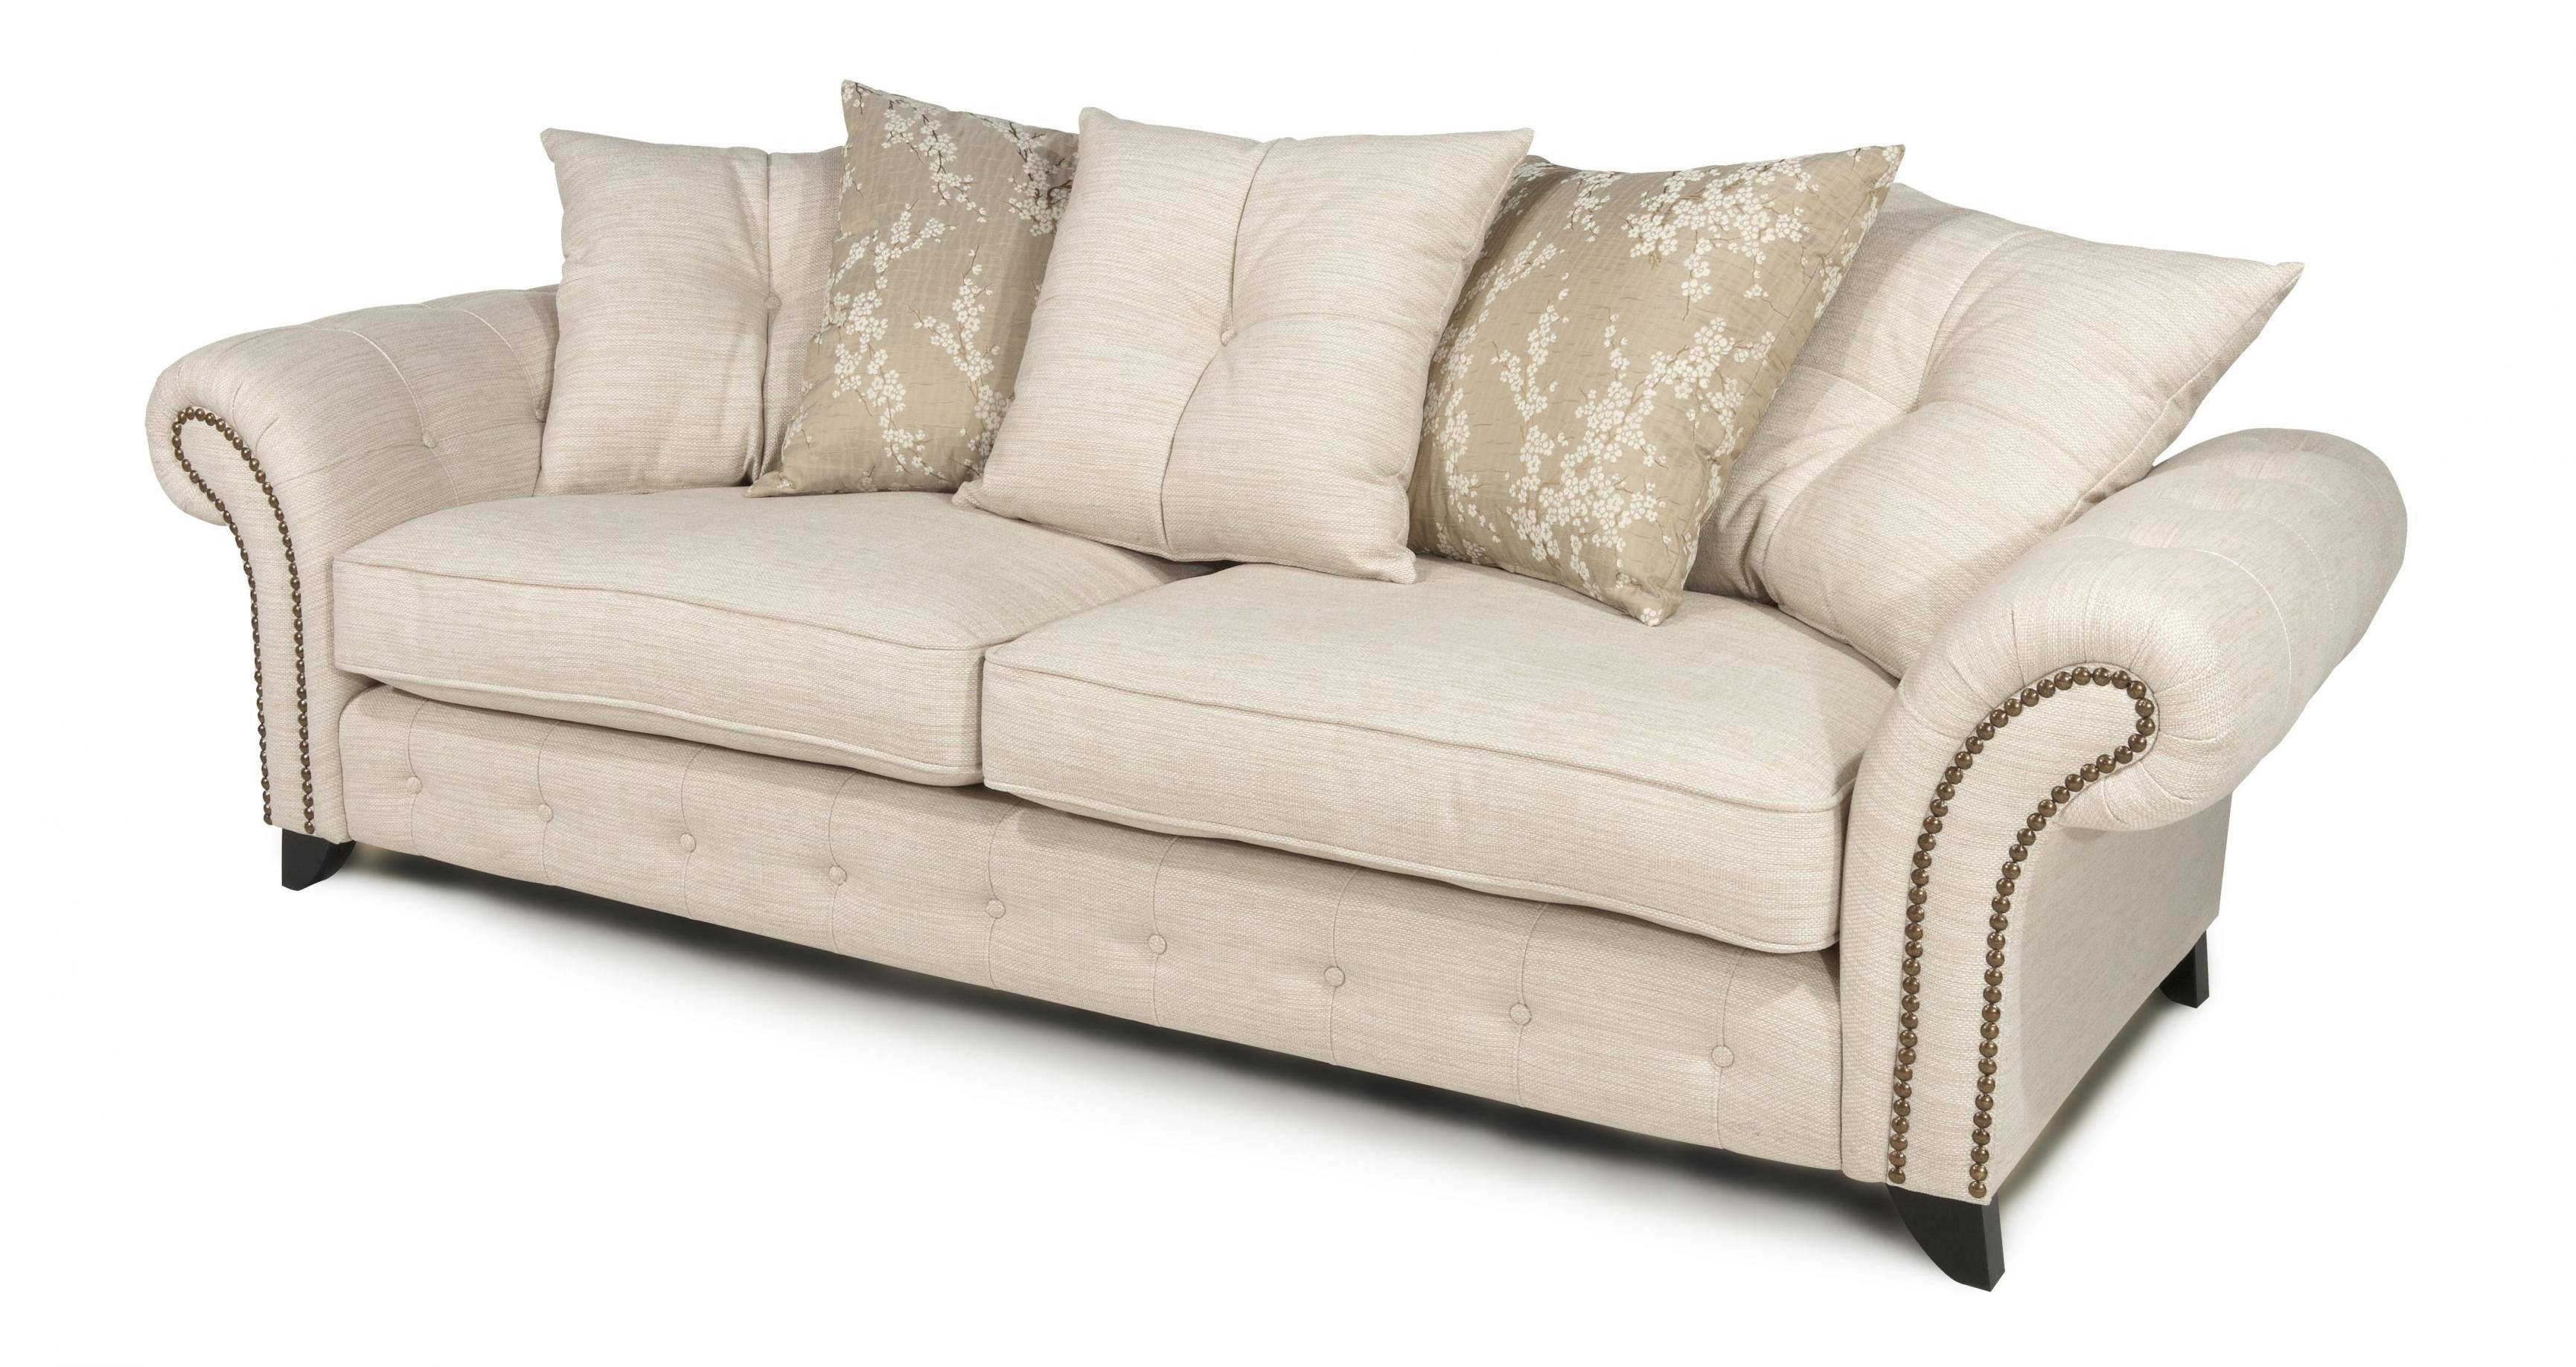 Elegant Fabric Sofas 27 With Elegant Fabric Sofas   Simoon Throughout Elegant  Fabric Sofas (Image